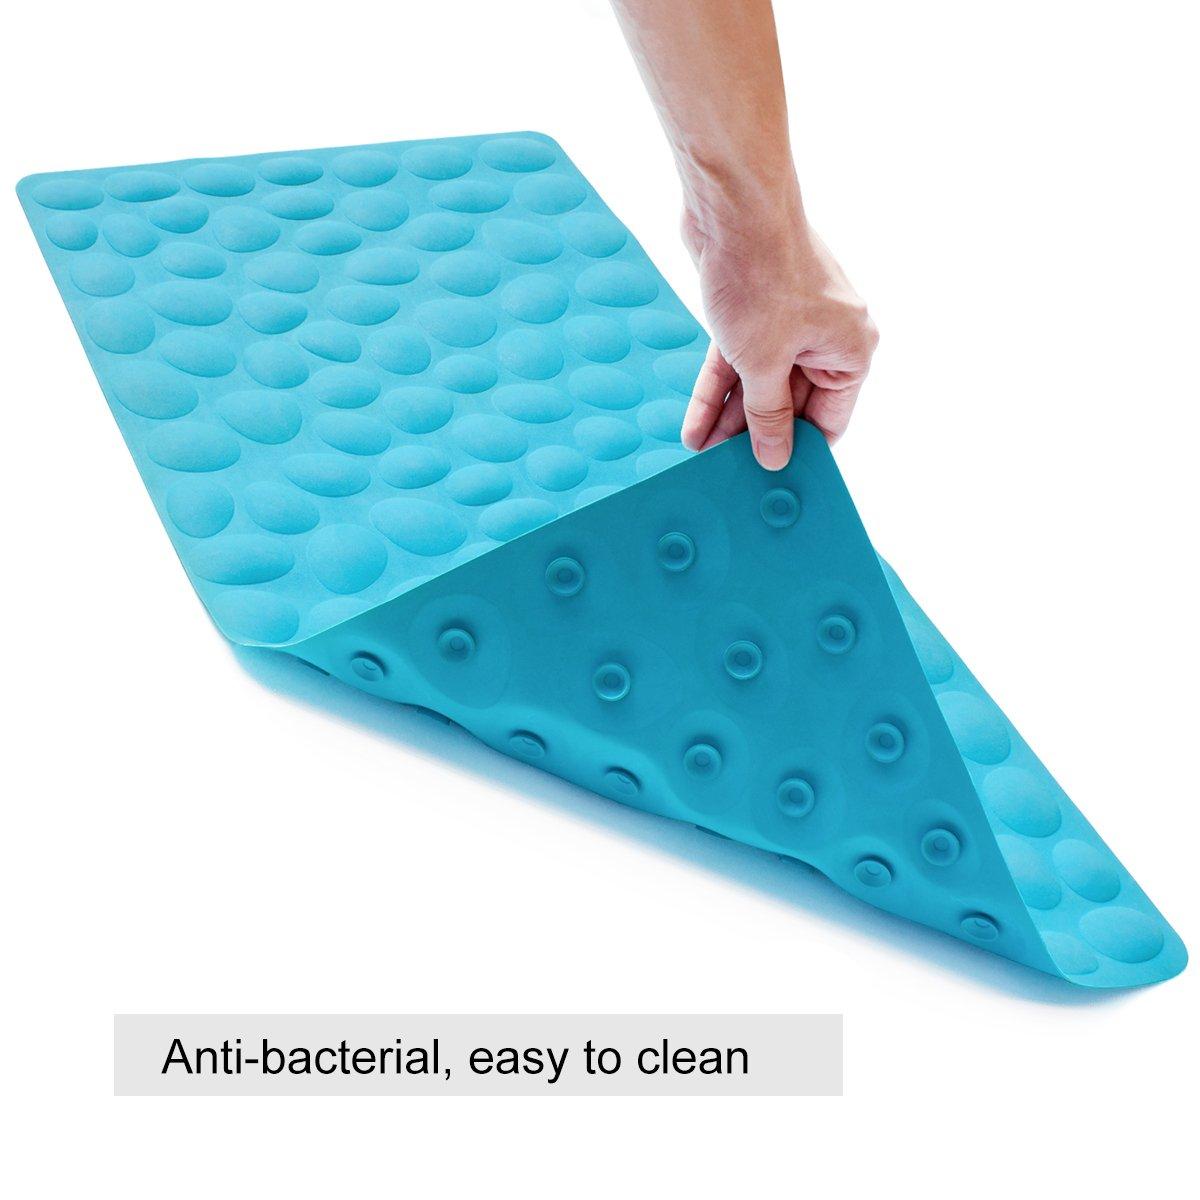 Othway Non Slip Bathtub Mat Soft Rubber Bathroom Bathmat